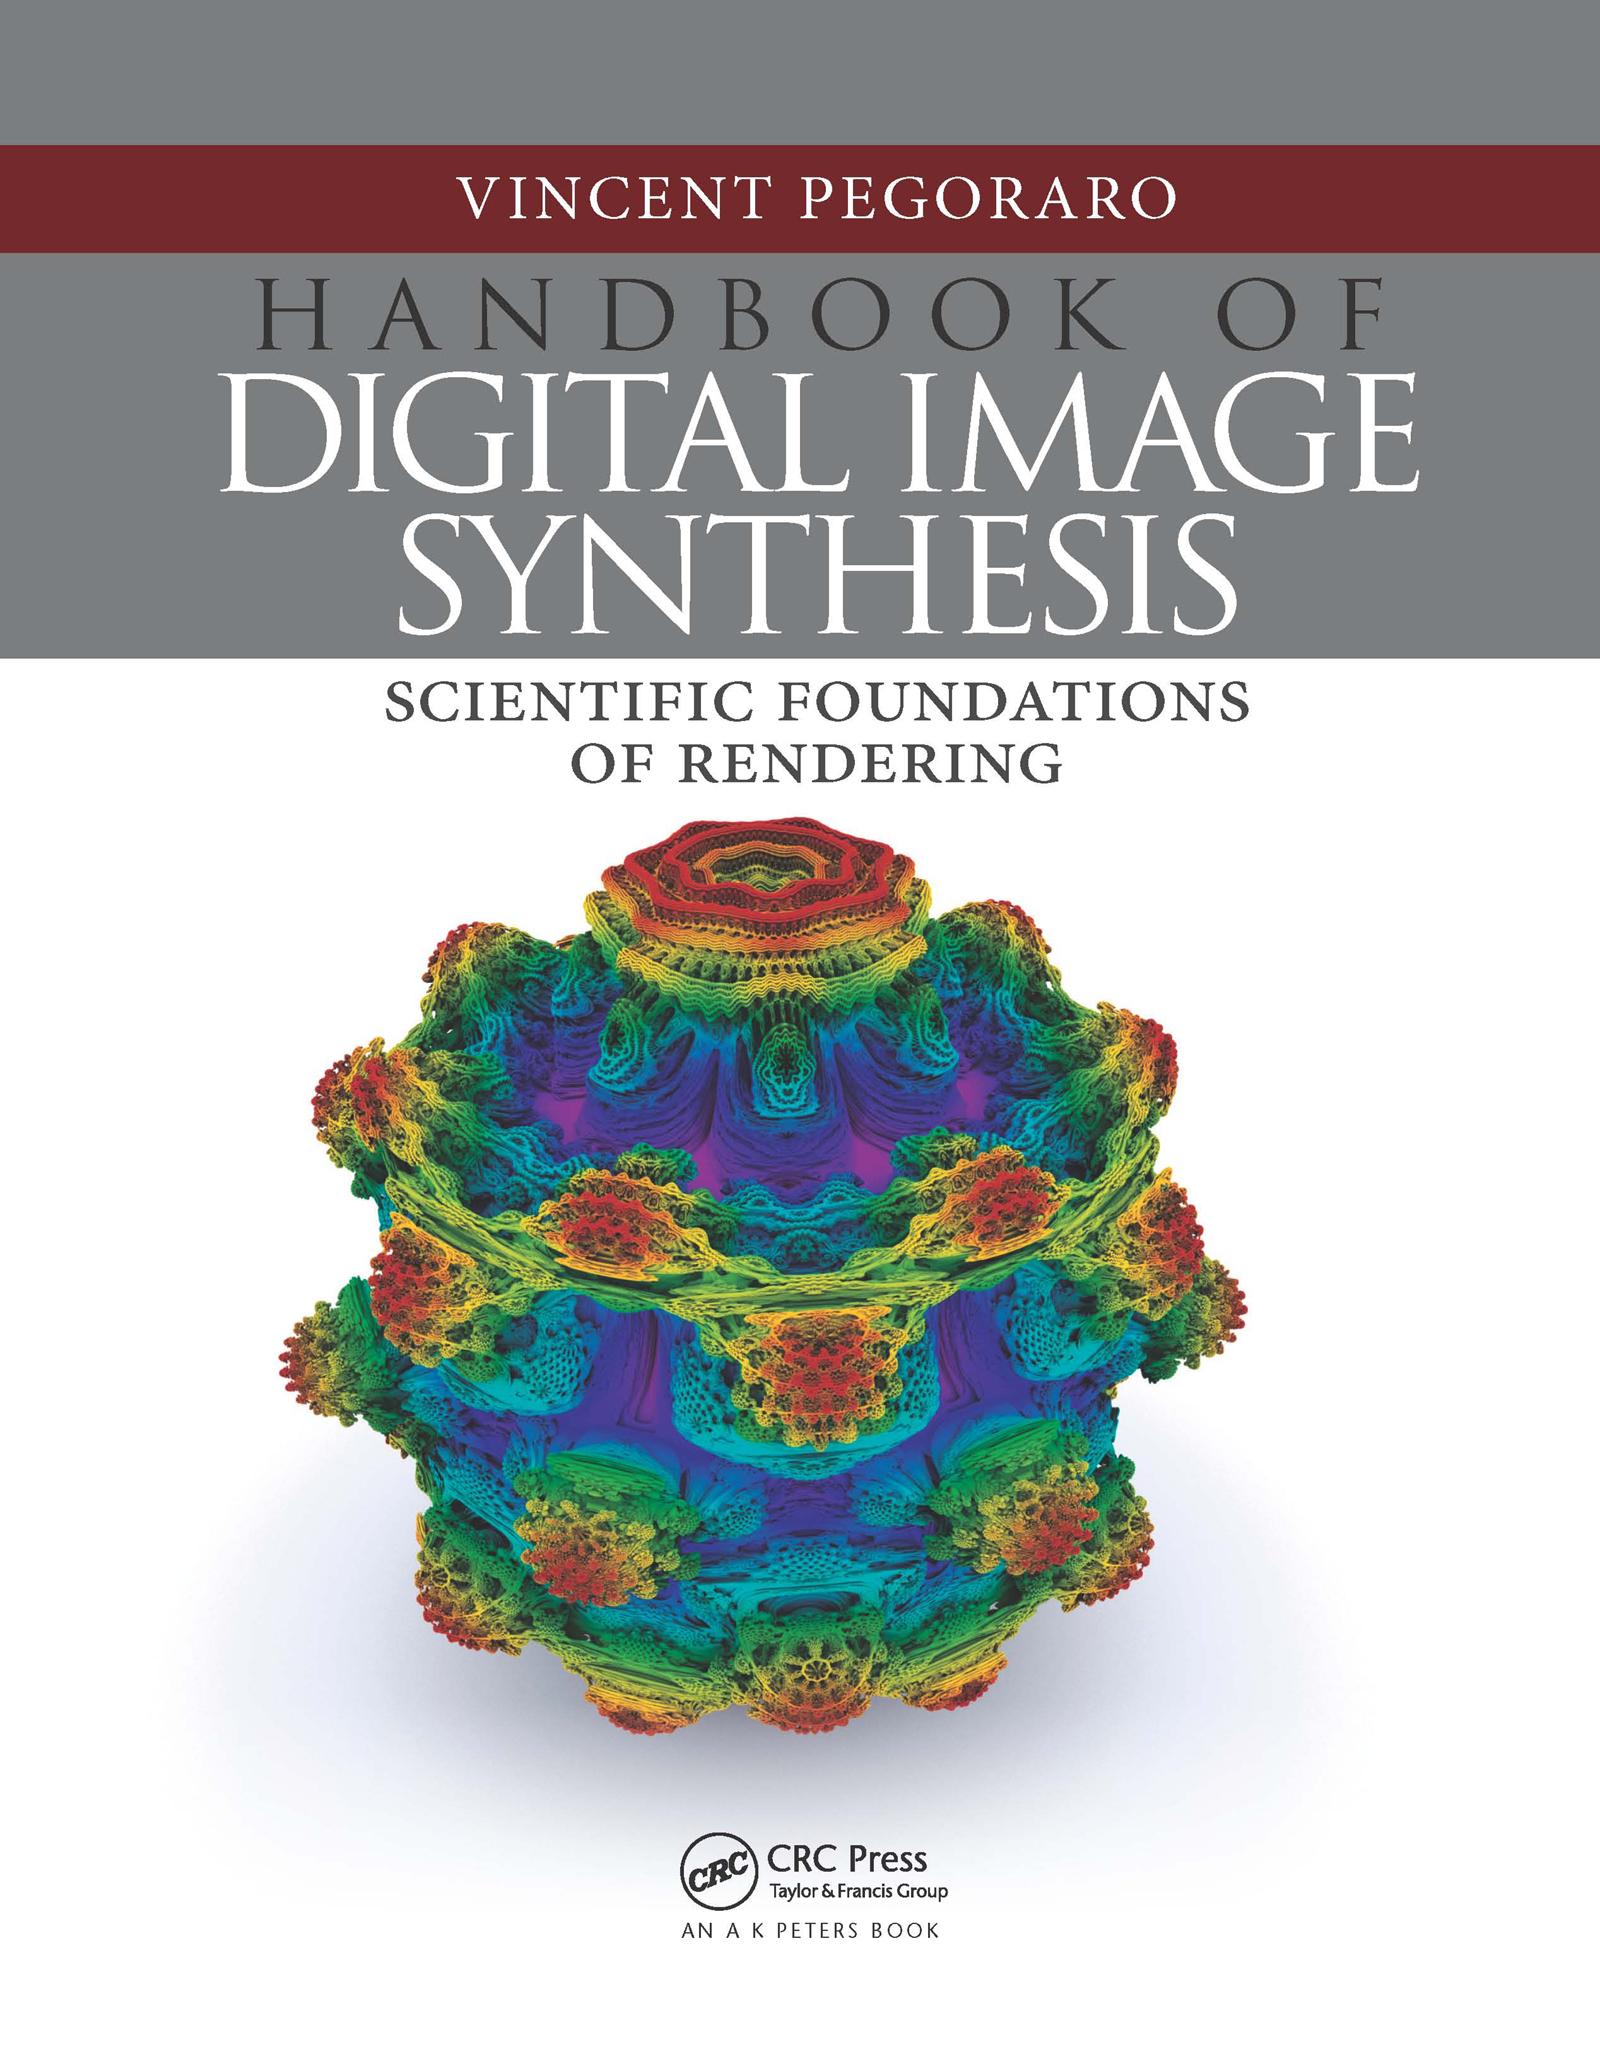 Handbook of Digital Image Synthesis